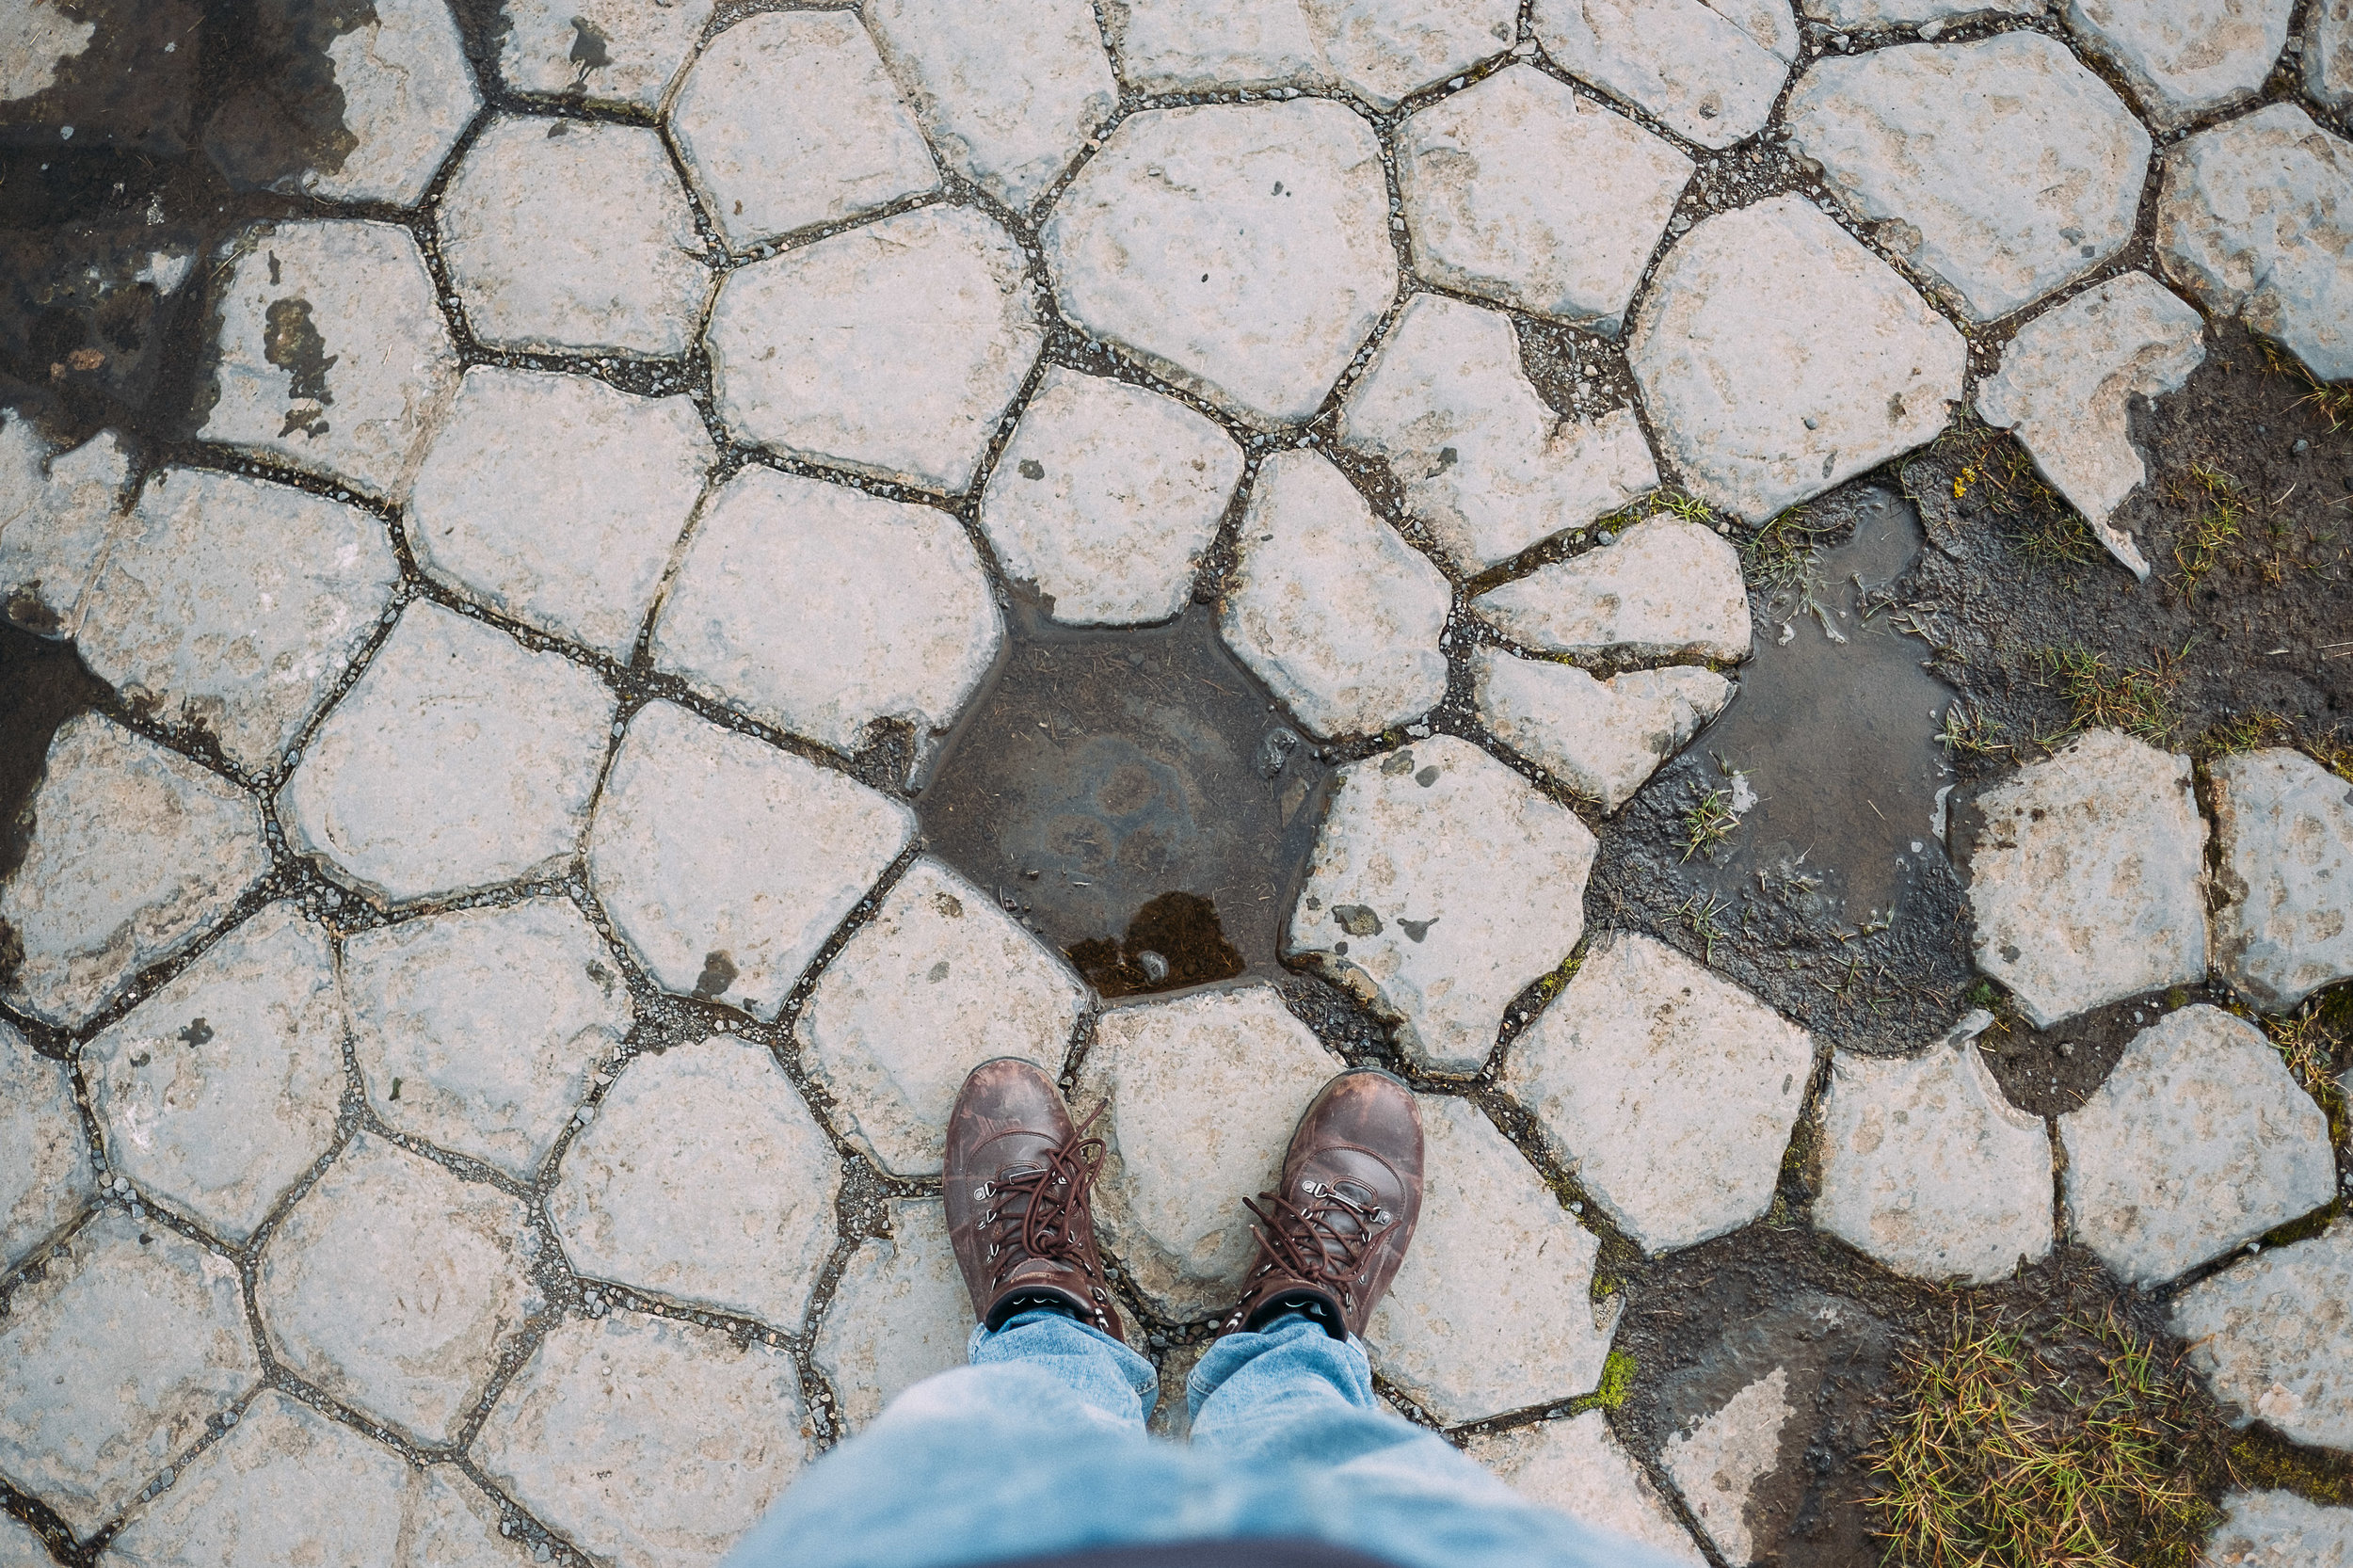 iceland feet-10.jpg